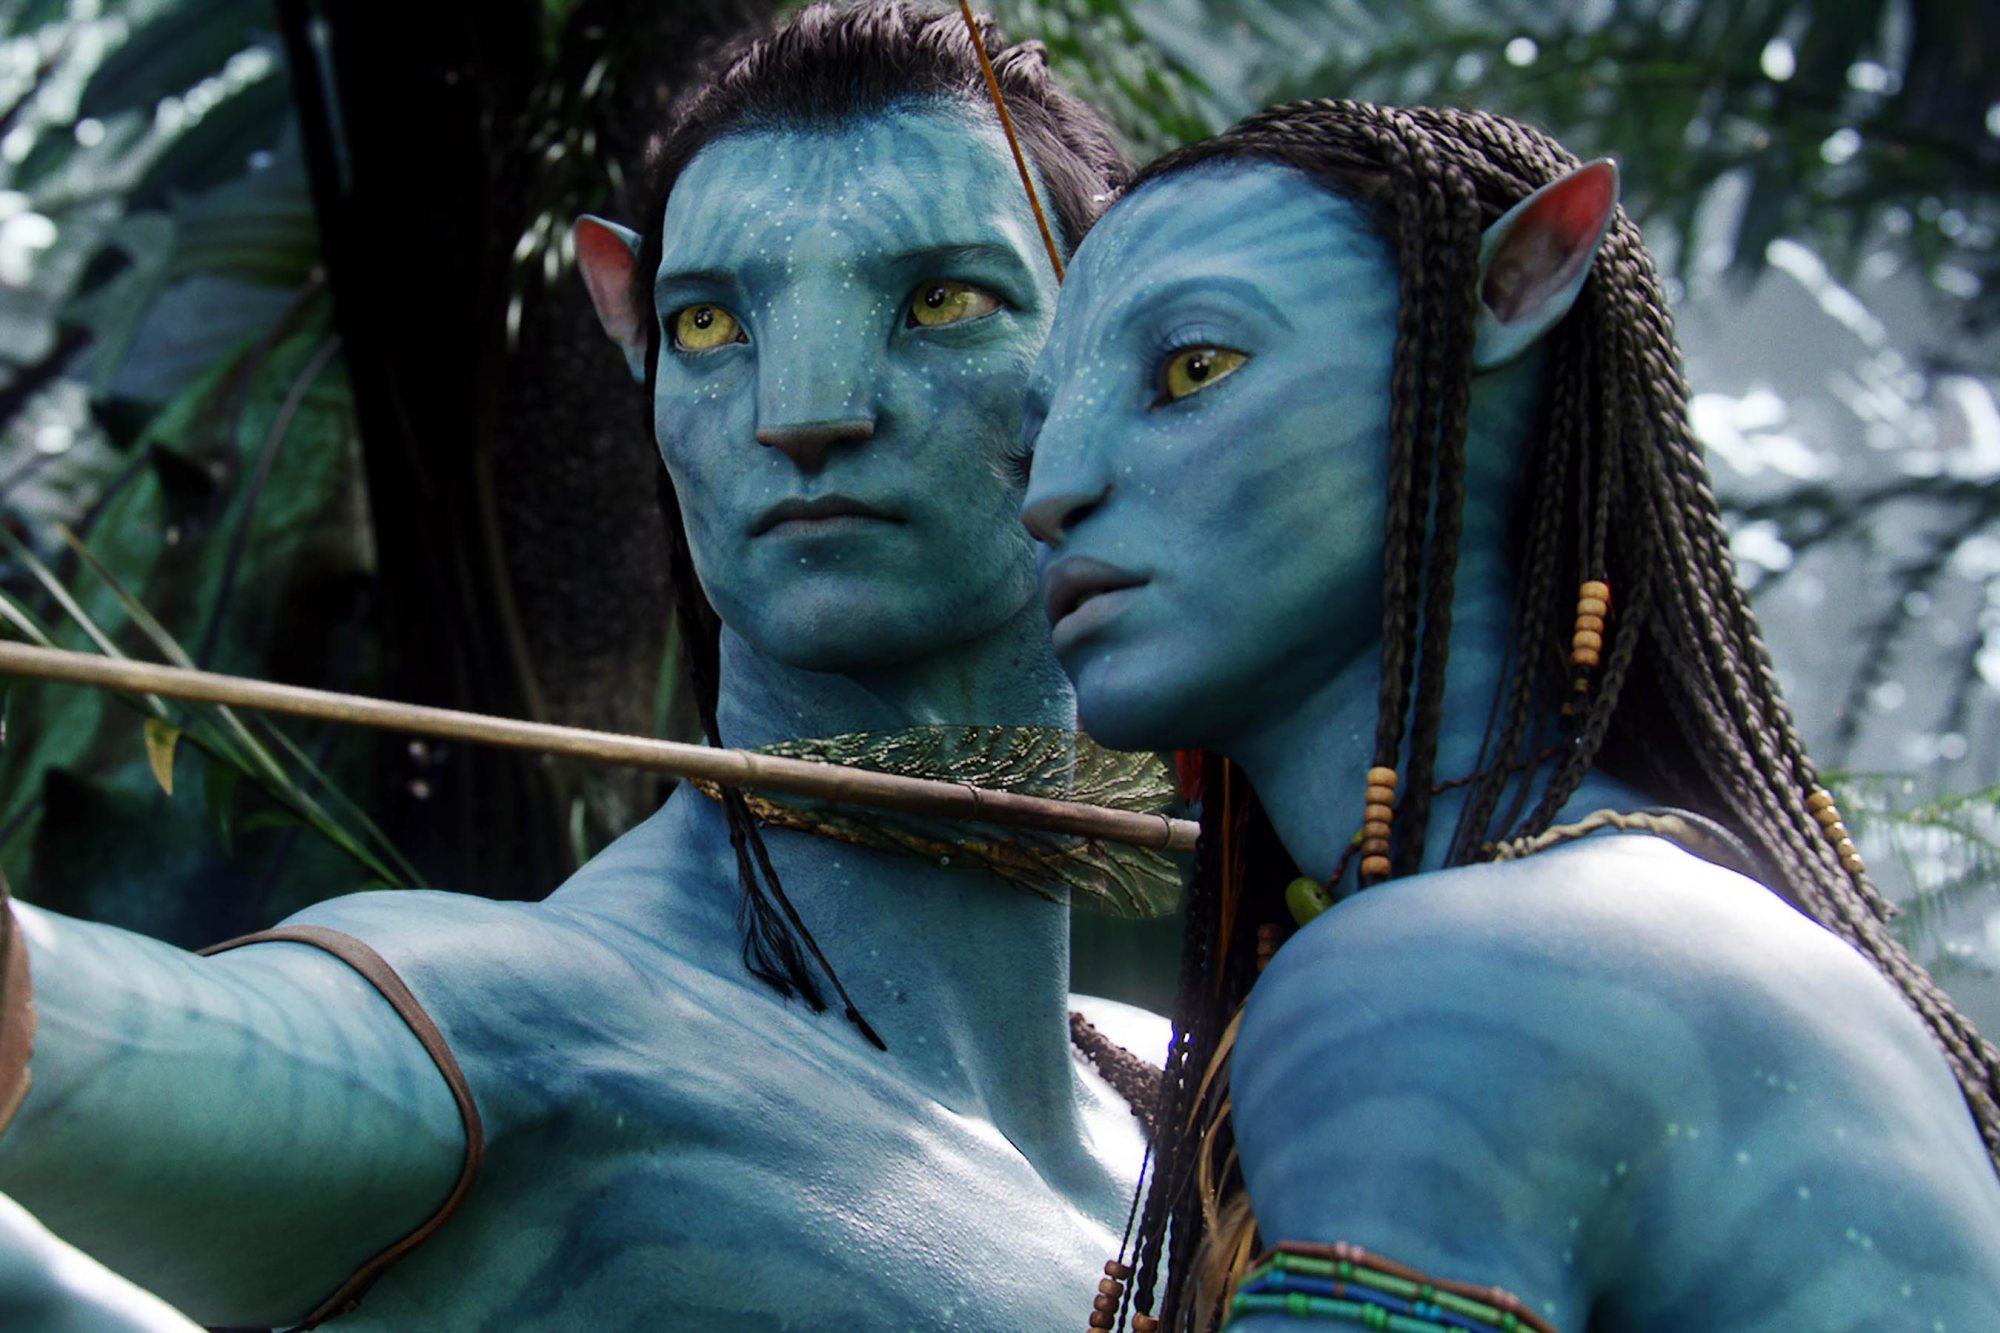 Avatar (2009) Sam Worthington and Zoe Saldana CR: WETA